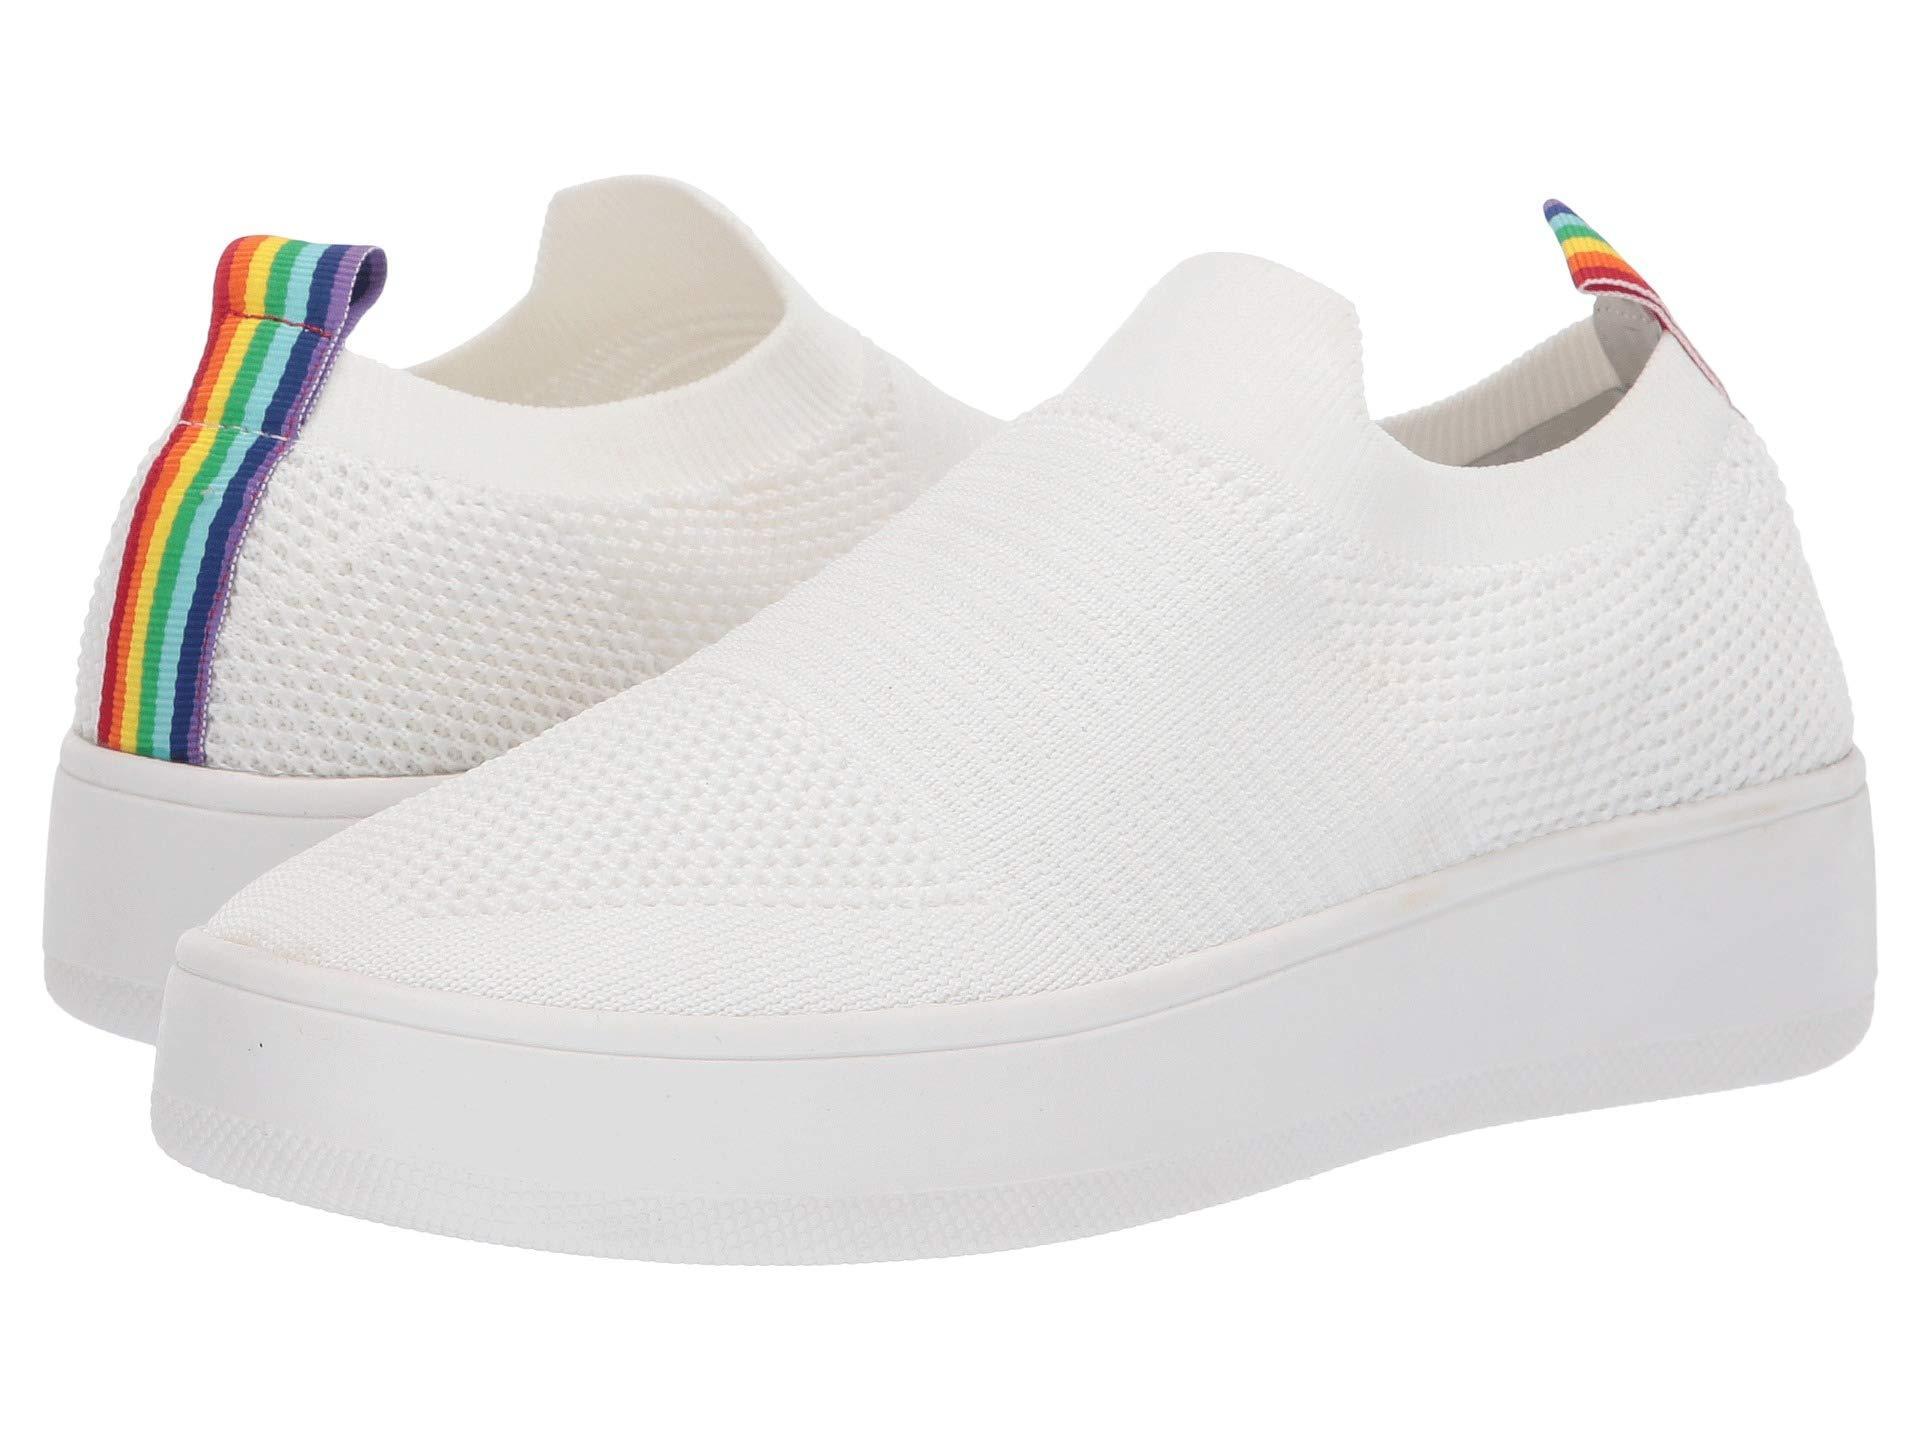 83527bbdfa1 Lyst - Steve Madden Beale (white) Women s Shoes in White